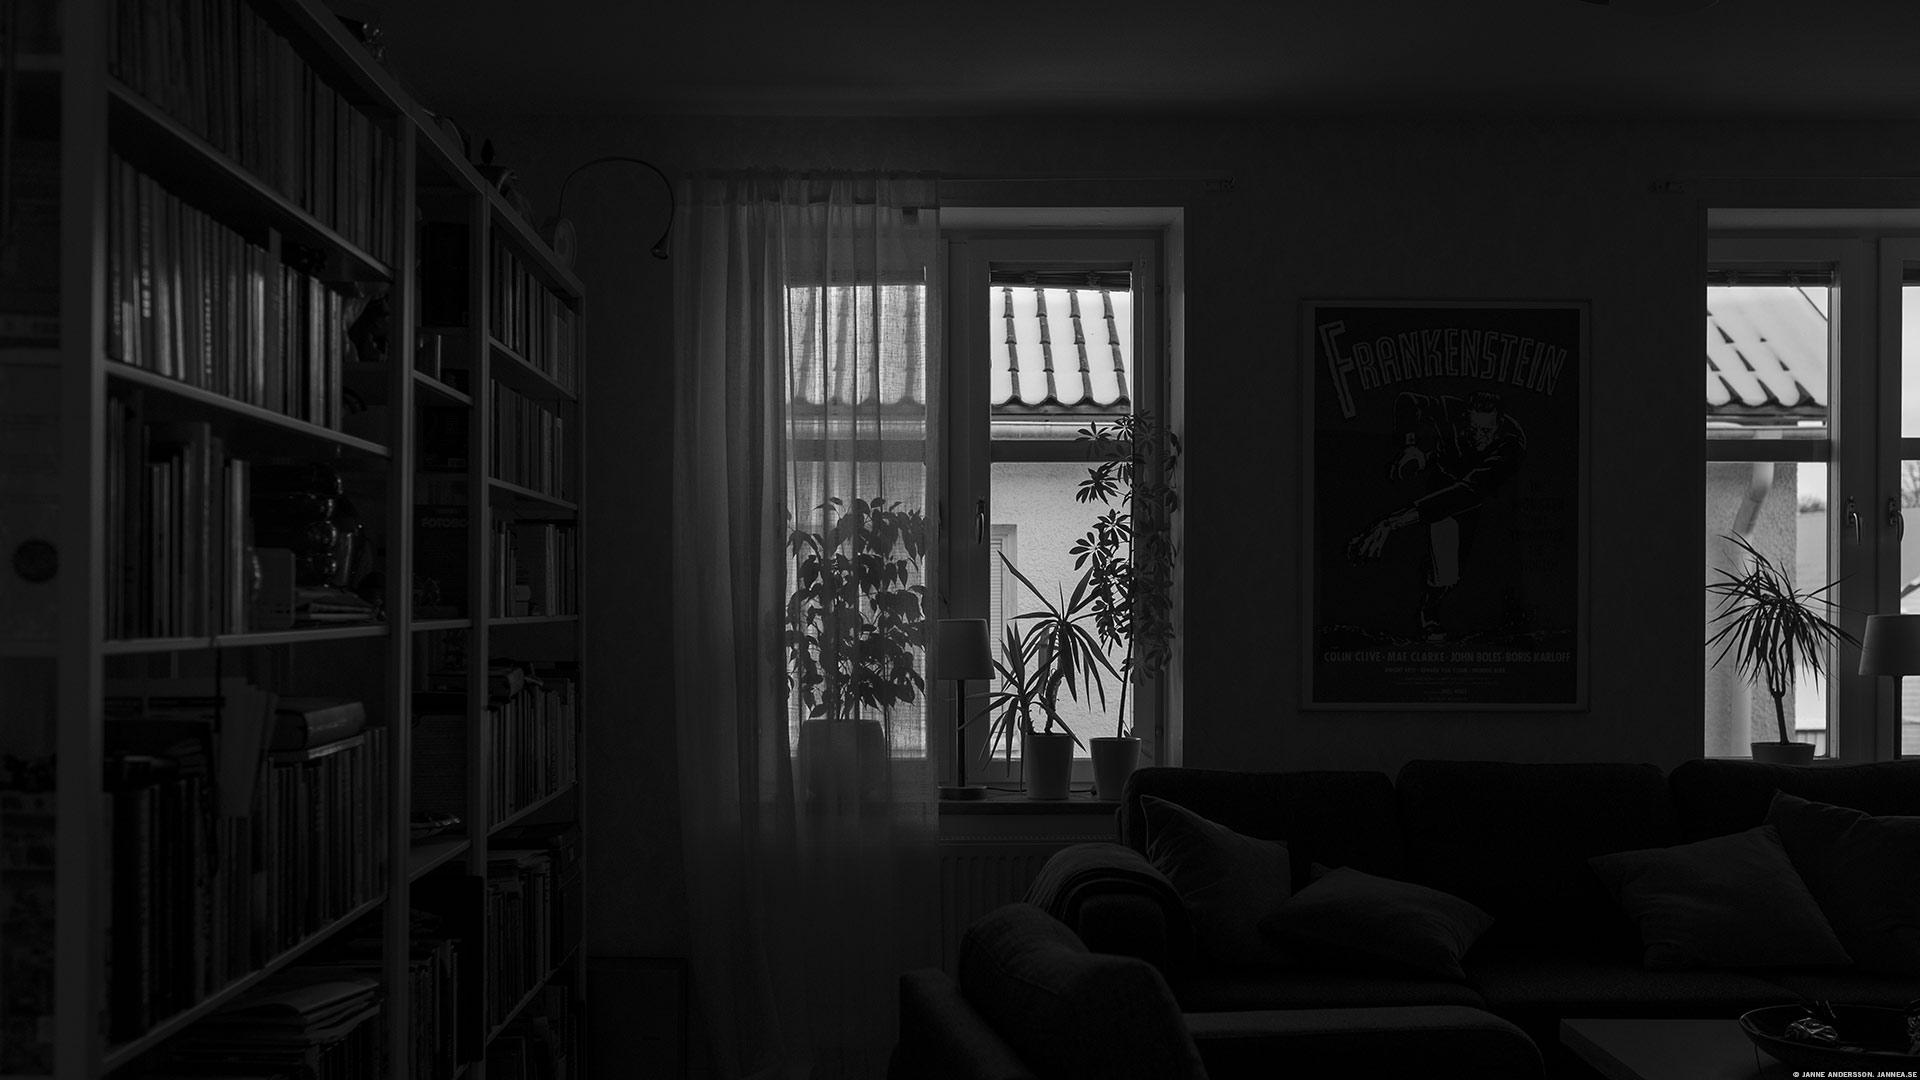 Fönster och ett mörkt rum |©Janne A